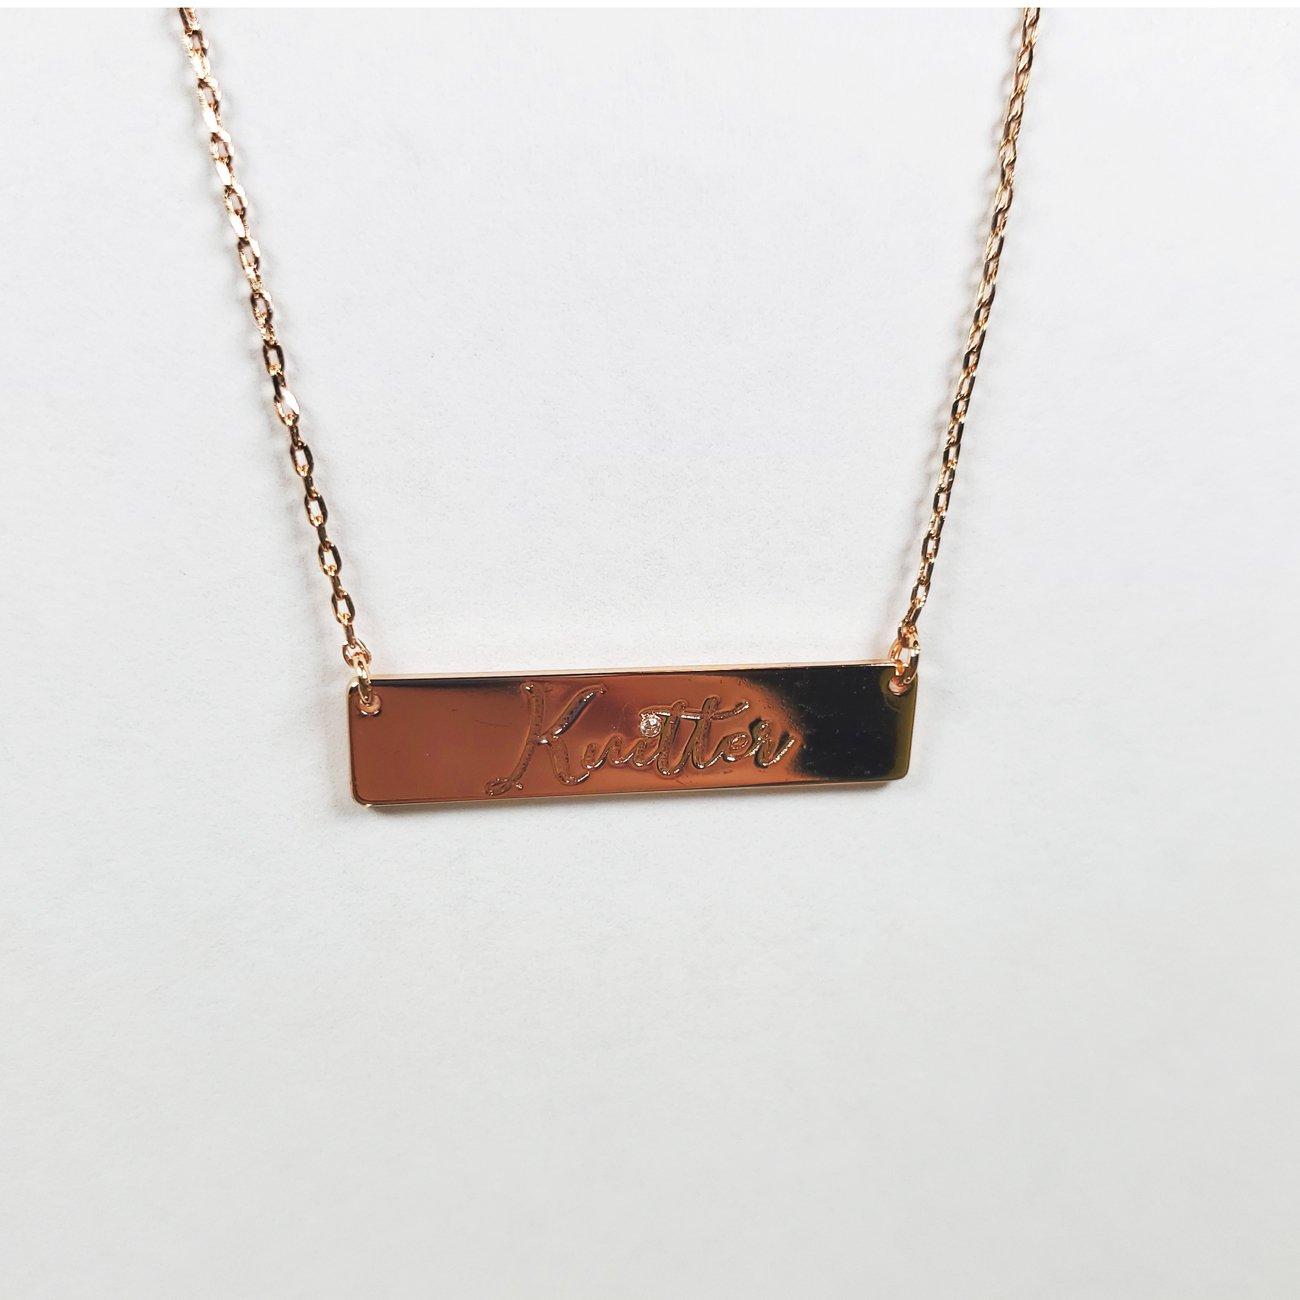 Knitter Bar Necklace Rose Gold